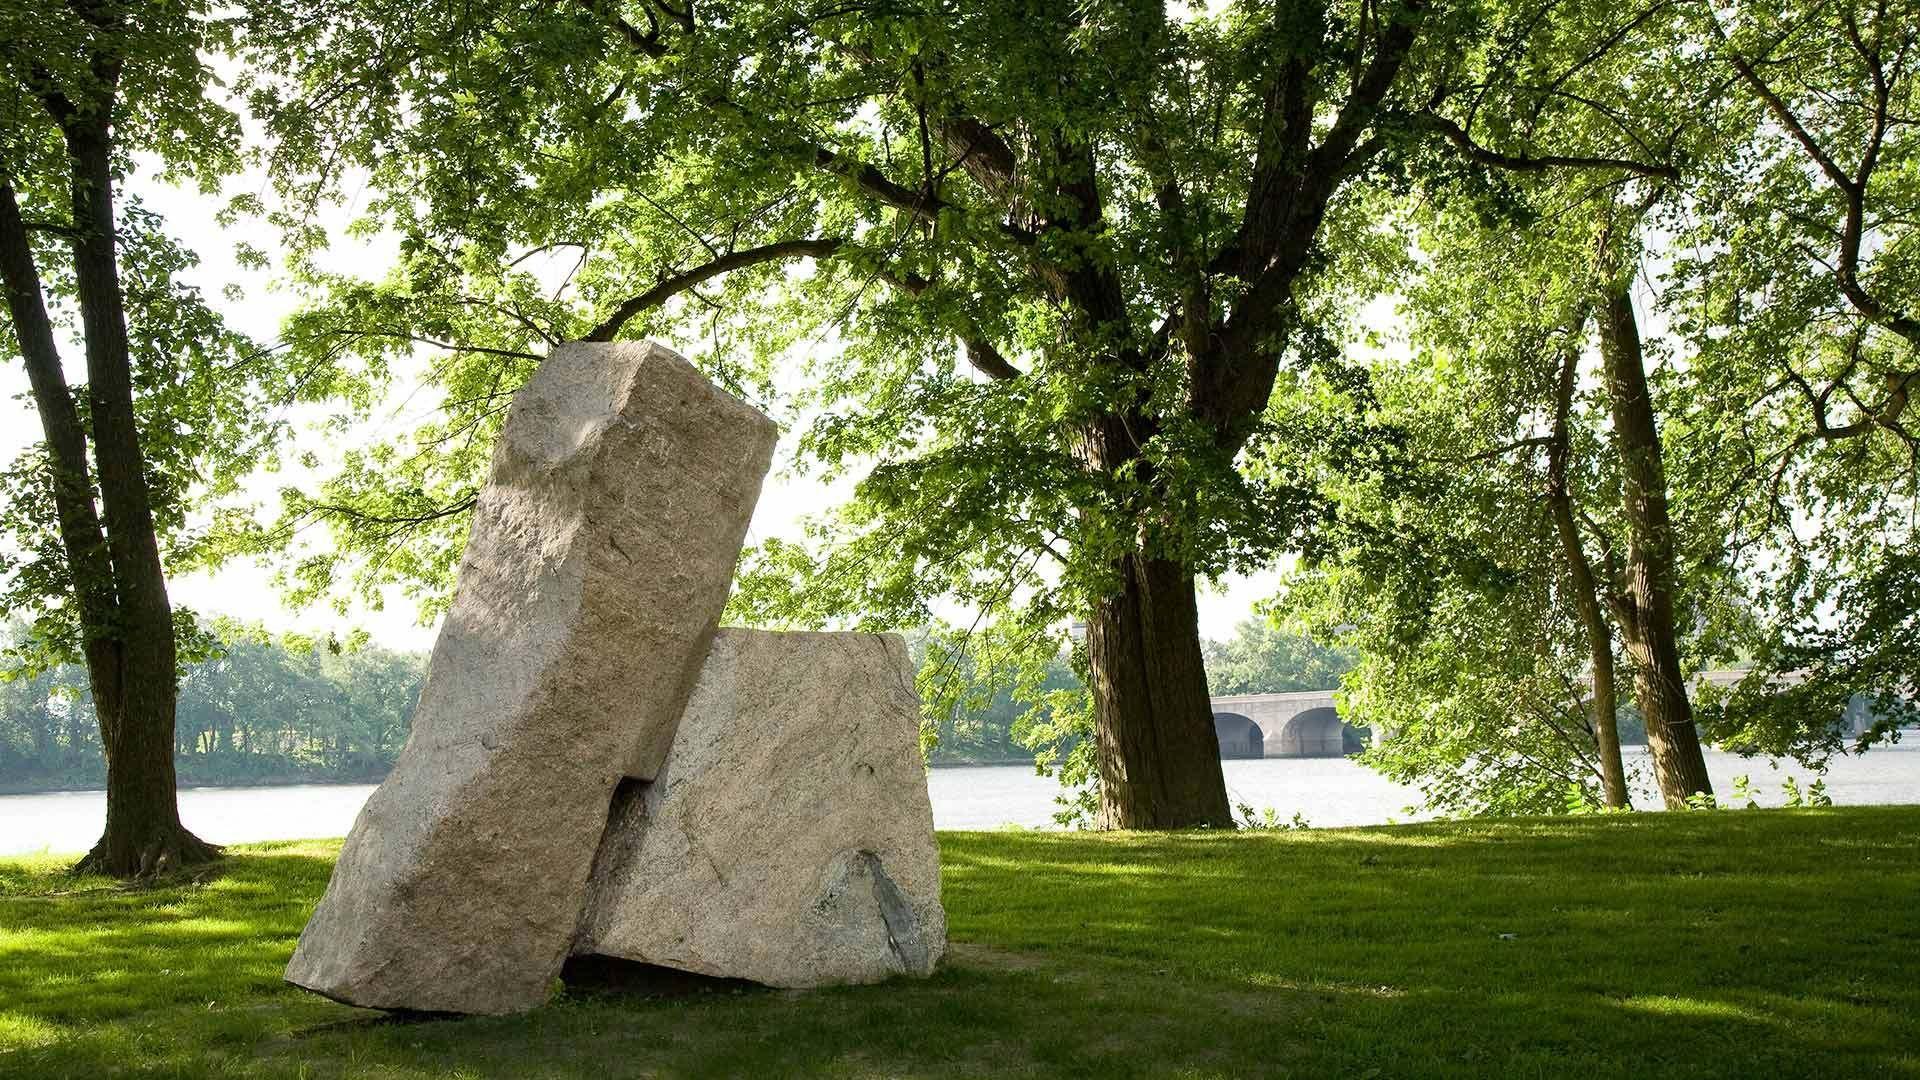 1darrell_sculpture_in_park